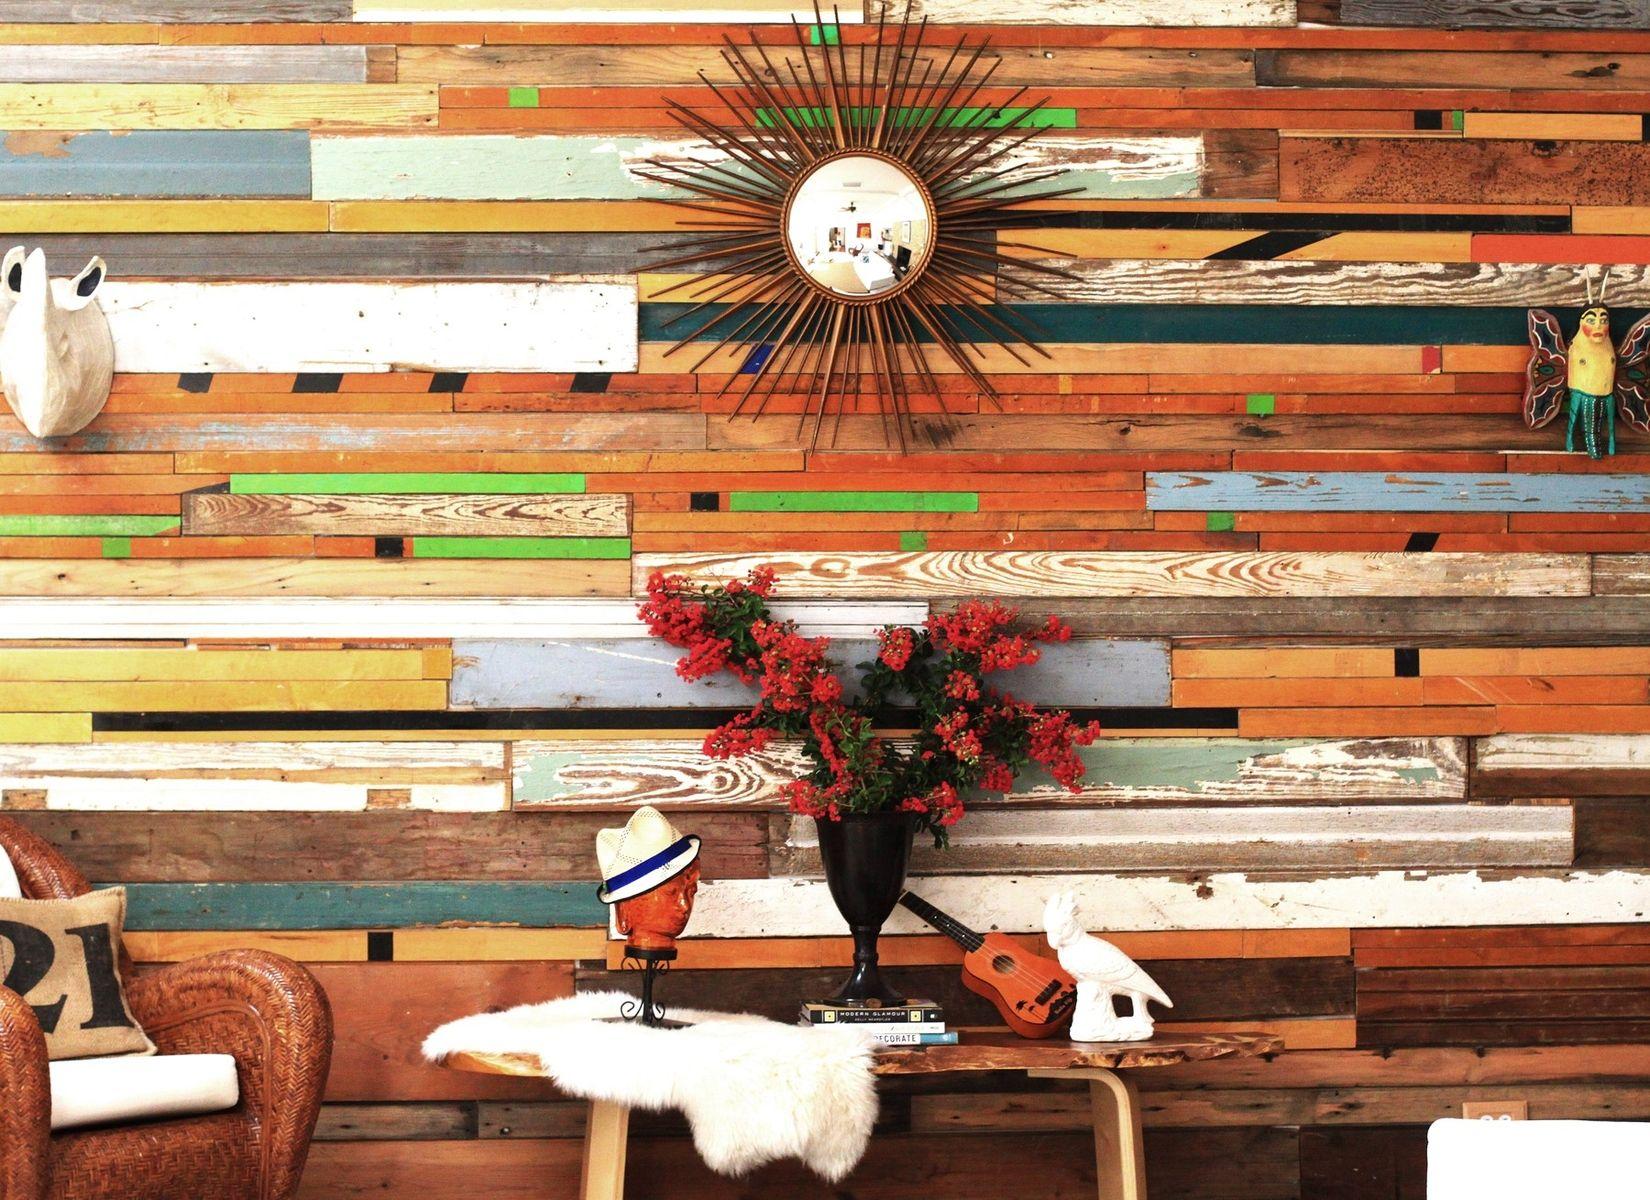 wood wall design sponge photo - 10